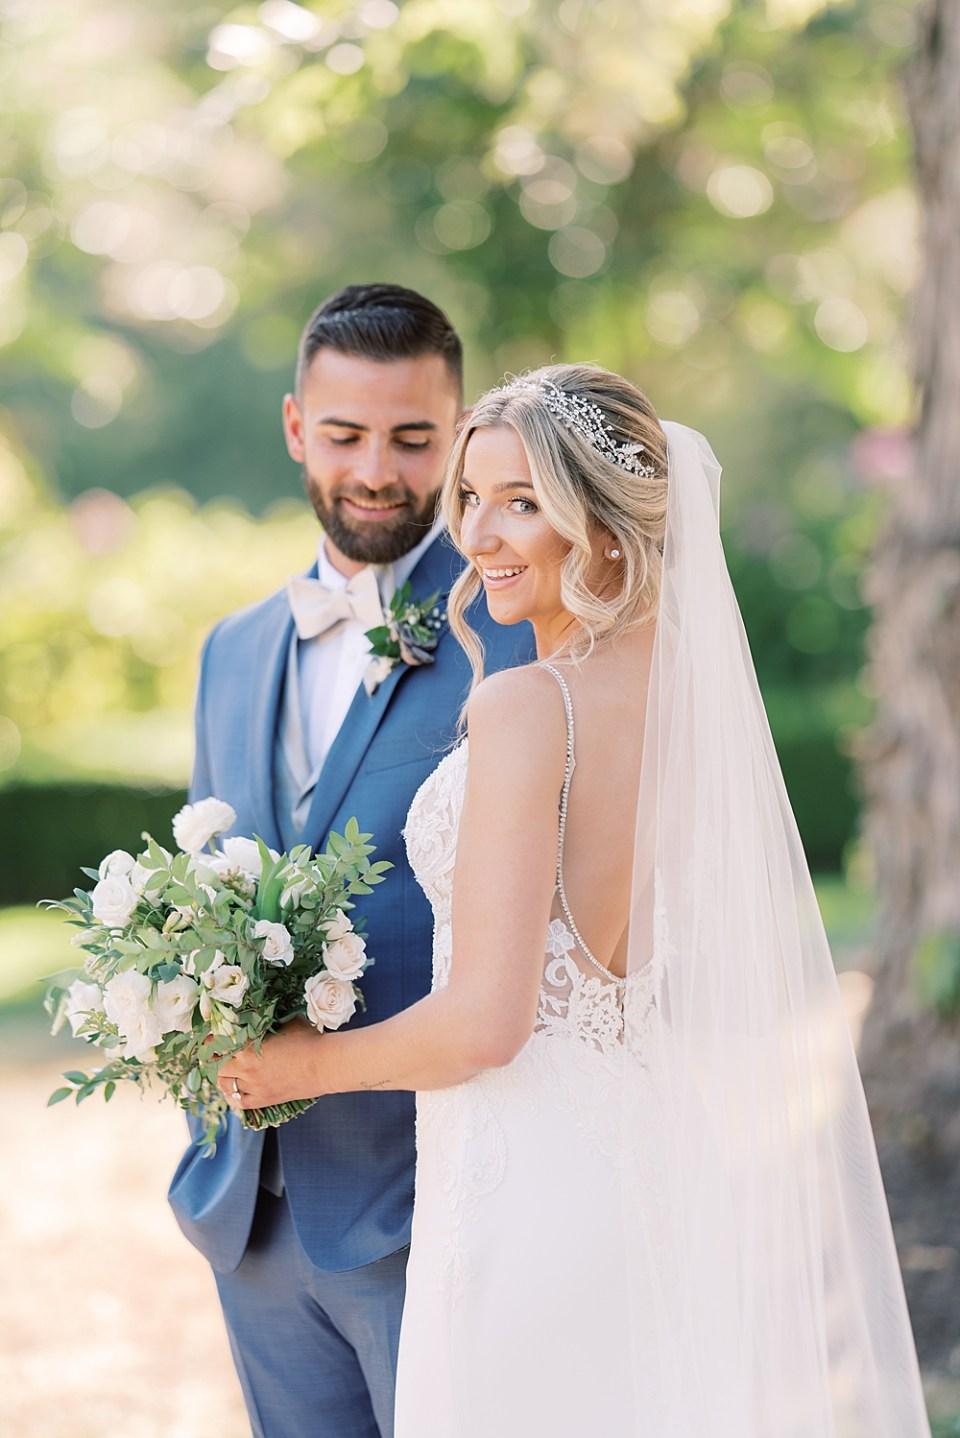 romantic wedding portraits | ashford estate wedding photography | sarah canning photography